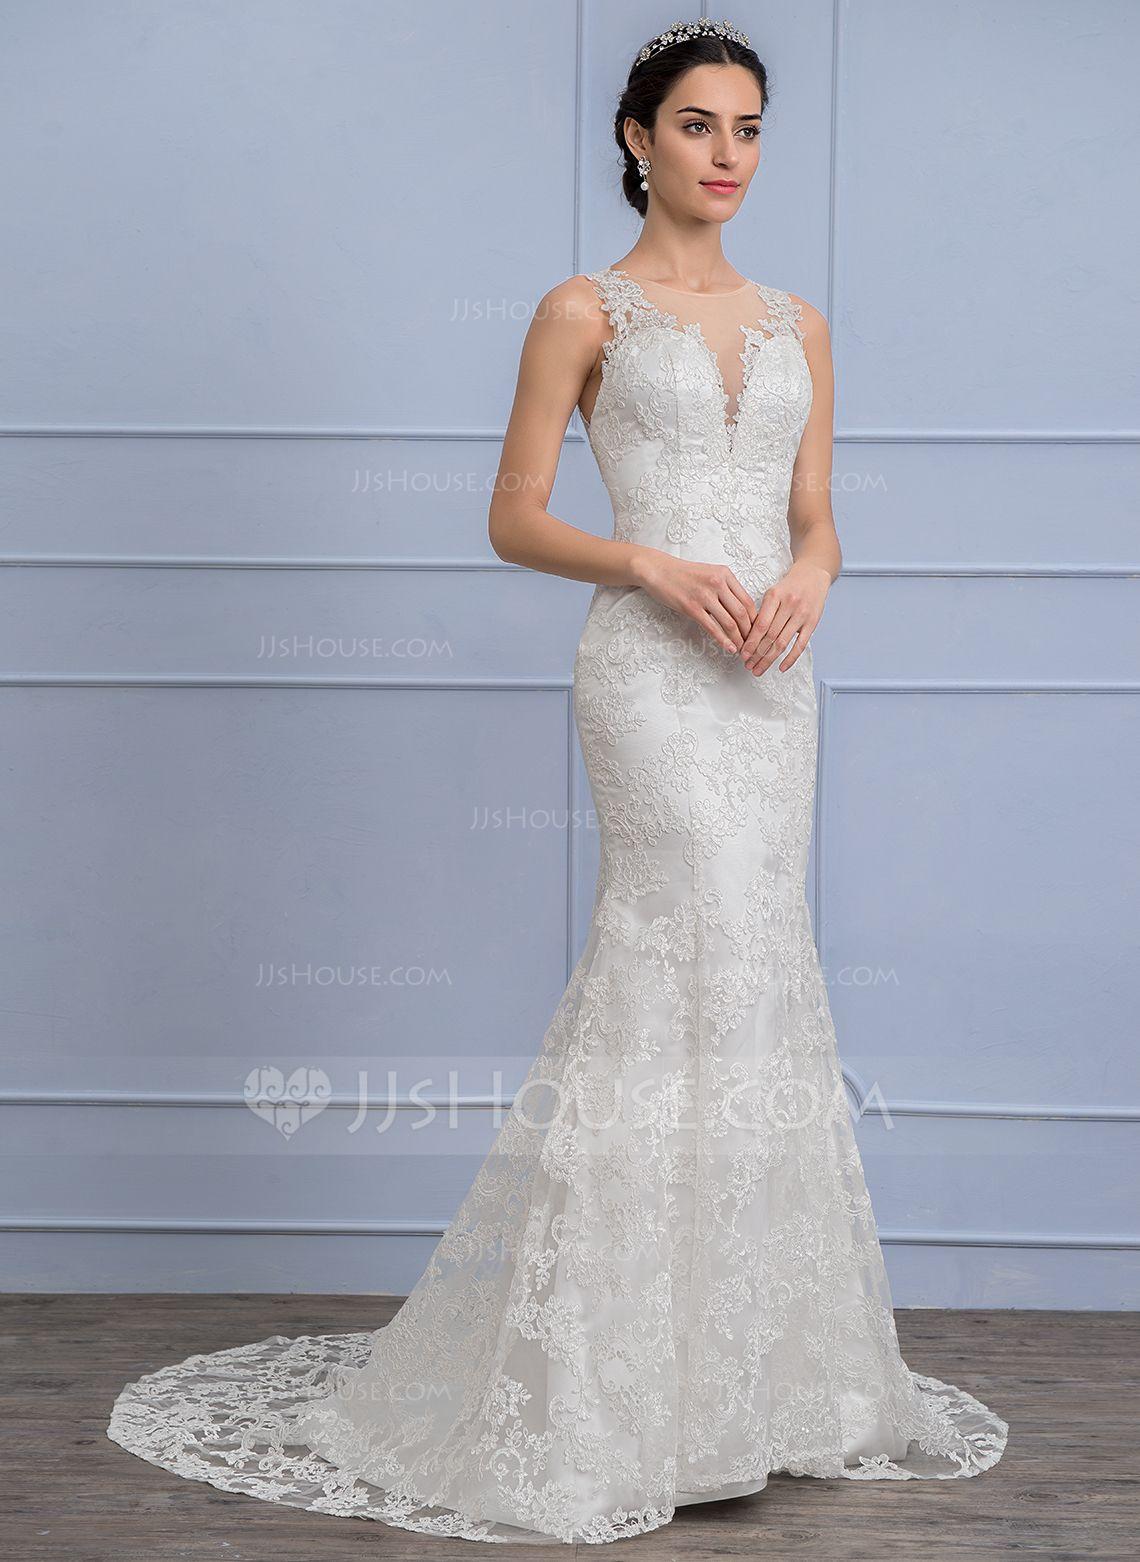 Us 262 00 Trumpet Mermaid Scoop Neck Court Train Lace Wedding Dress Jj S House Online Wedding Dress Wedding Dresses Lace Affordable Wedding Dresses [ 1562 x 1140 Pixel ]